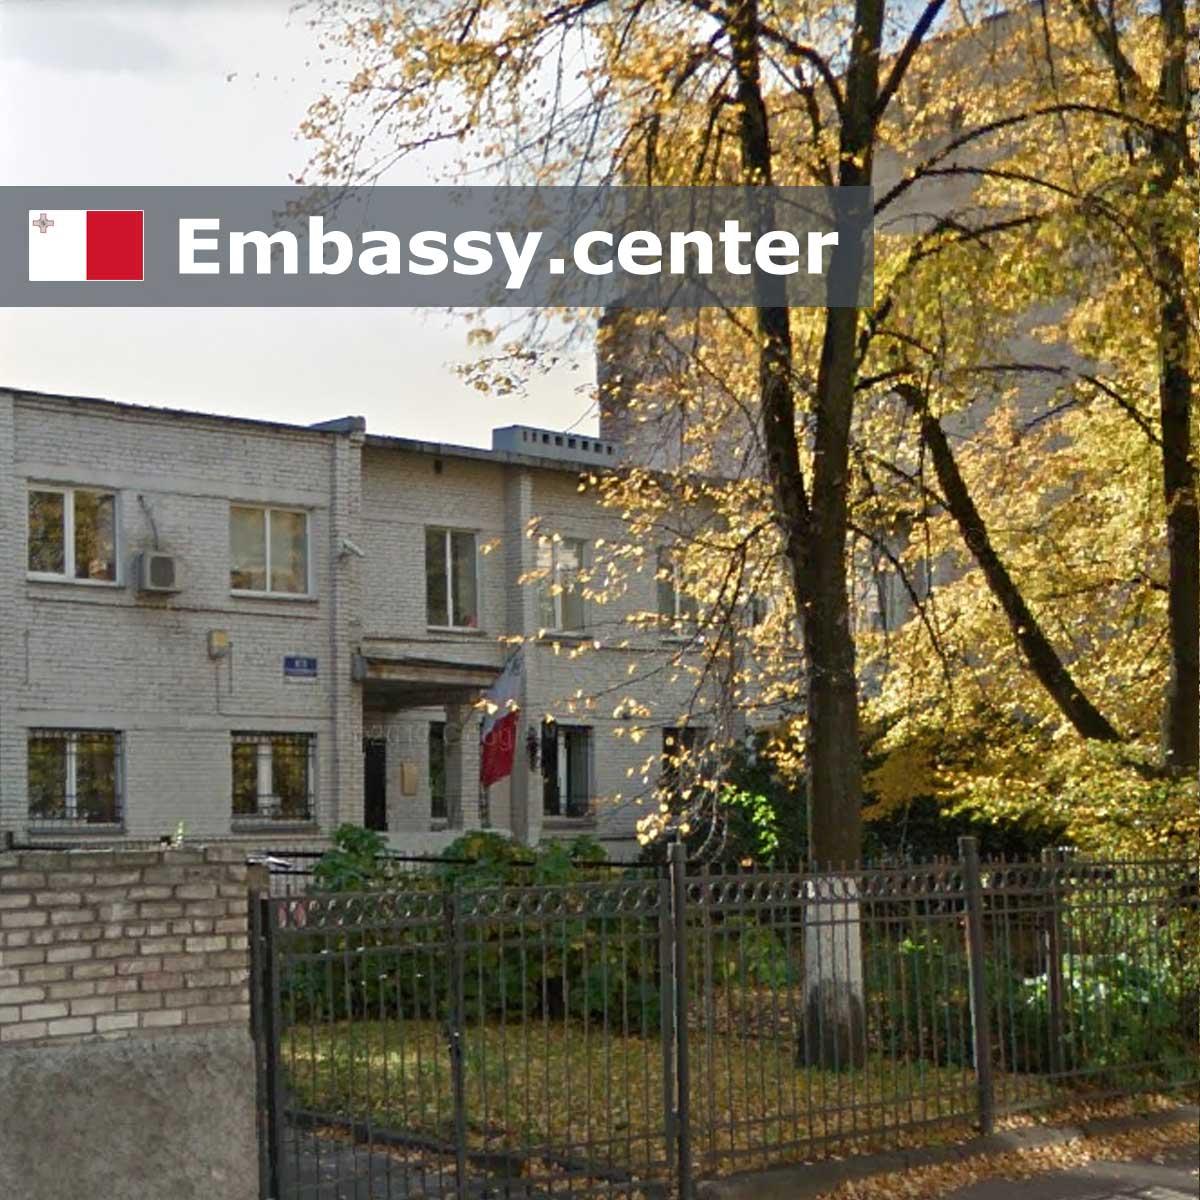 Honorary Consulate of Malta in Saint Petersburg, Russia